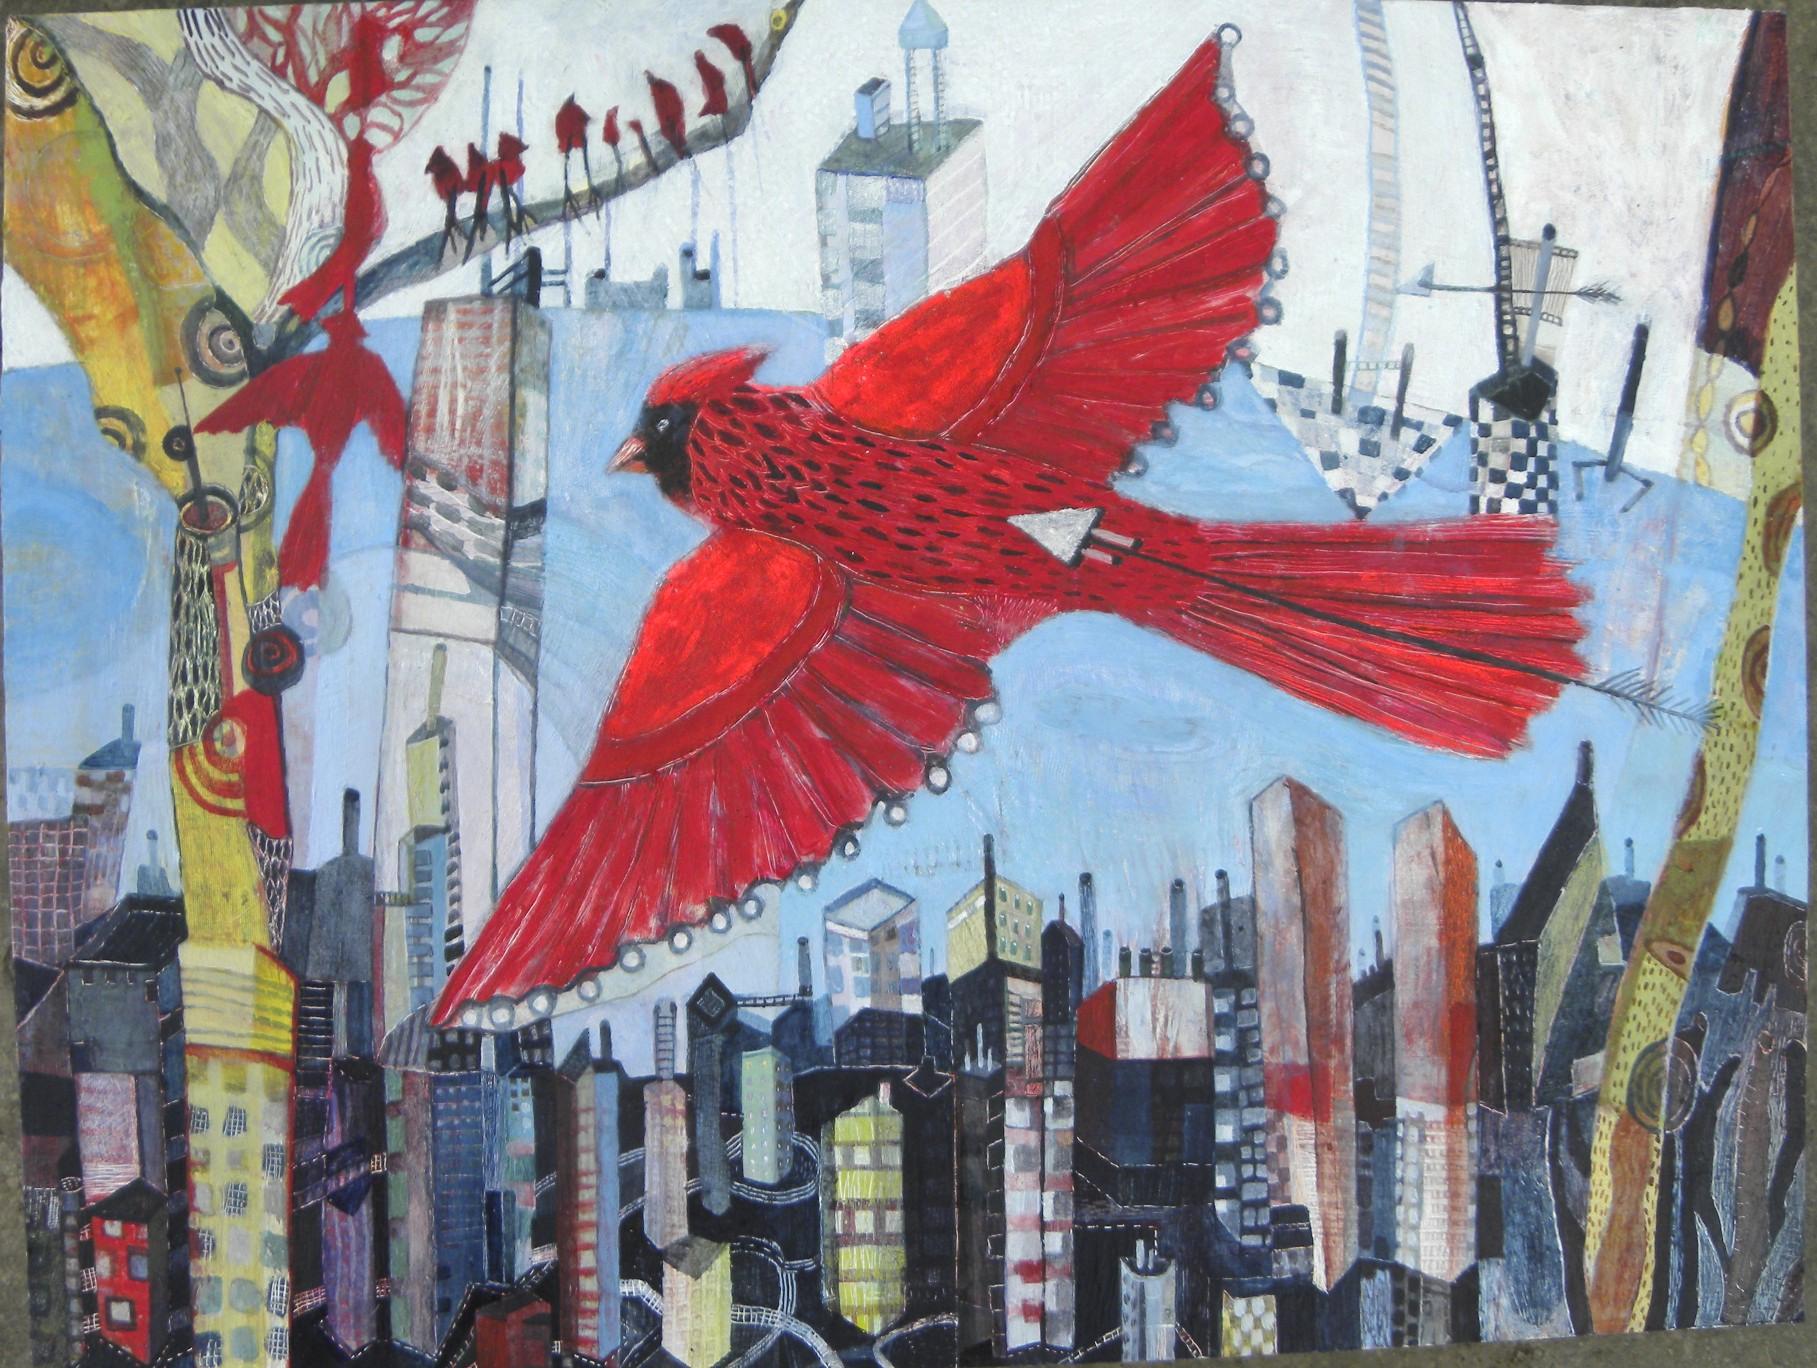 Zoe's cardinal